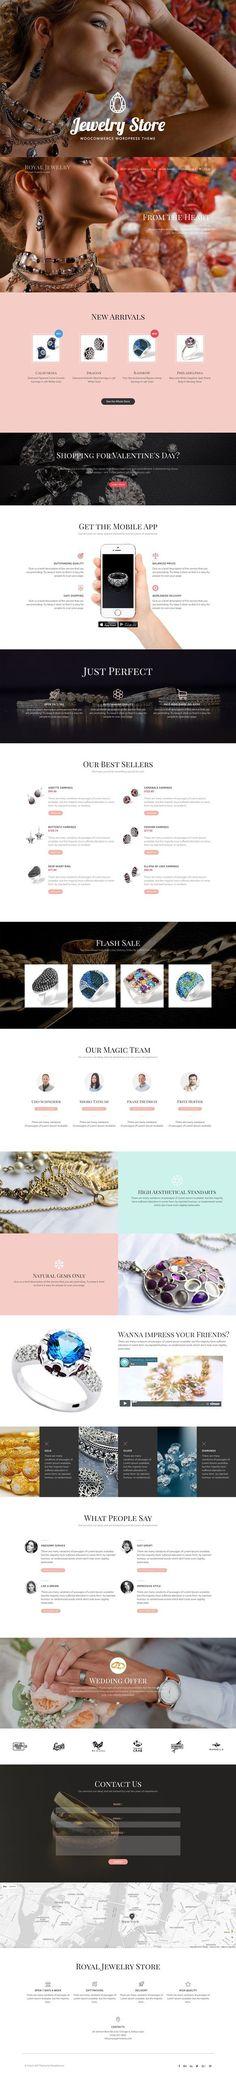 Jewelry Store wooComerce theme. WordPress eCommerce Themes